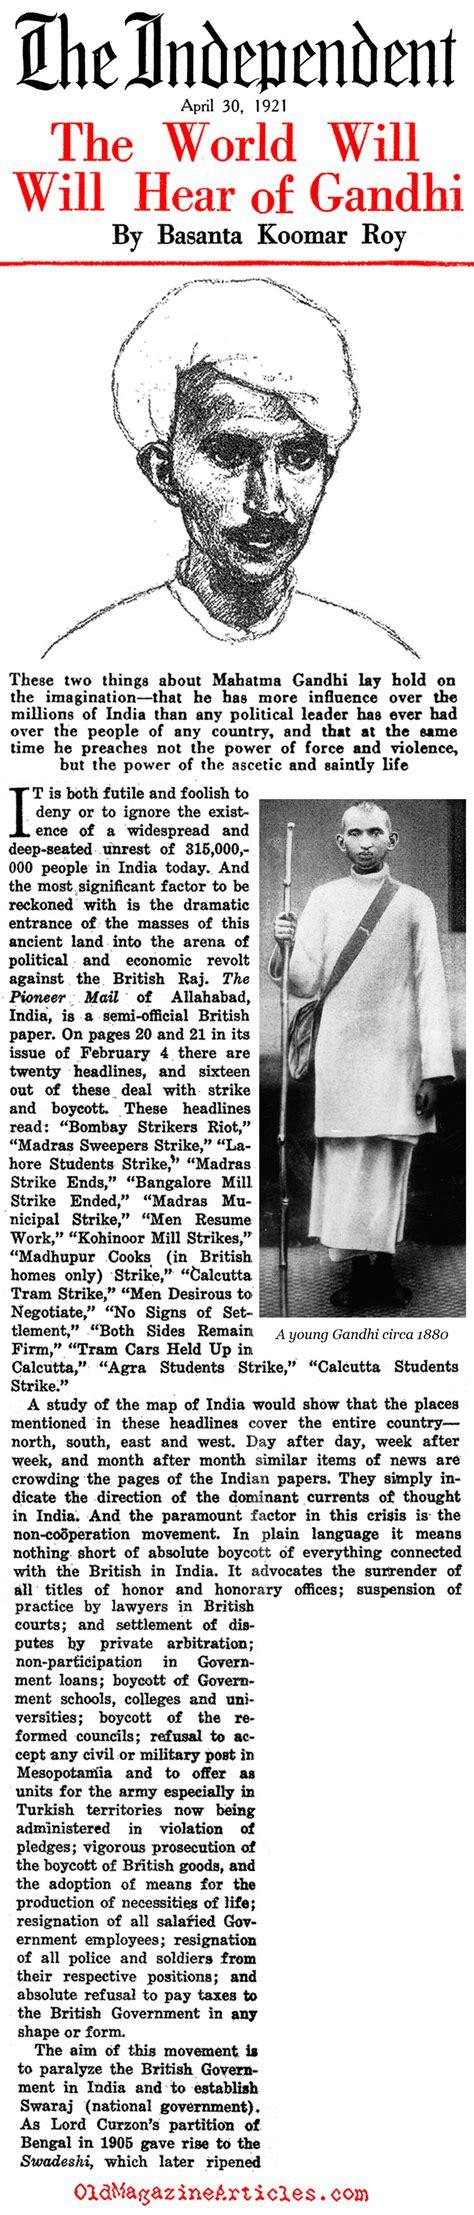 mahatma gandhi biography article મ હનદ સ કરમચ દ ગ ધ mahatma gandhi information mahatma